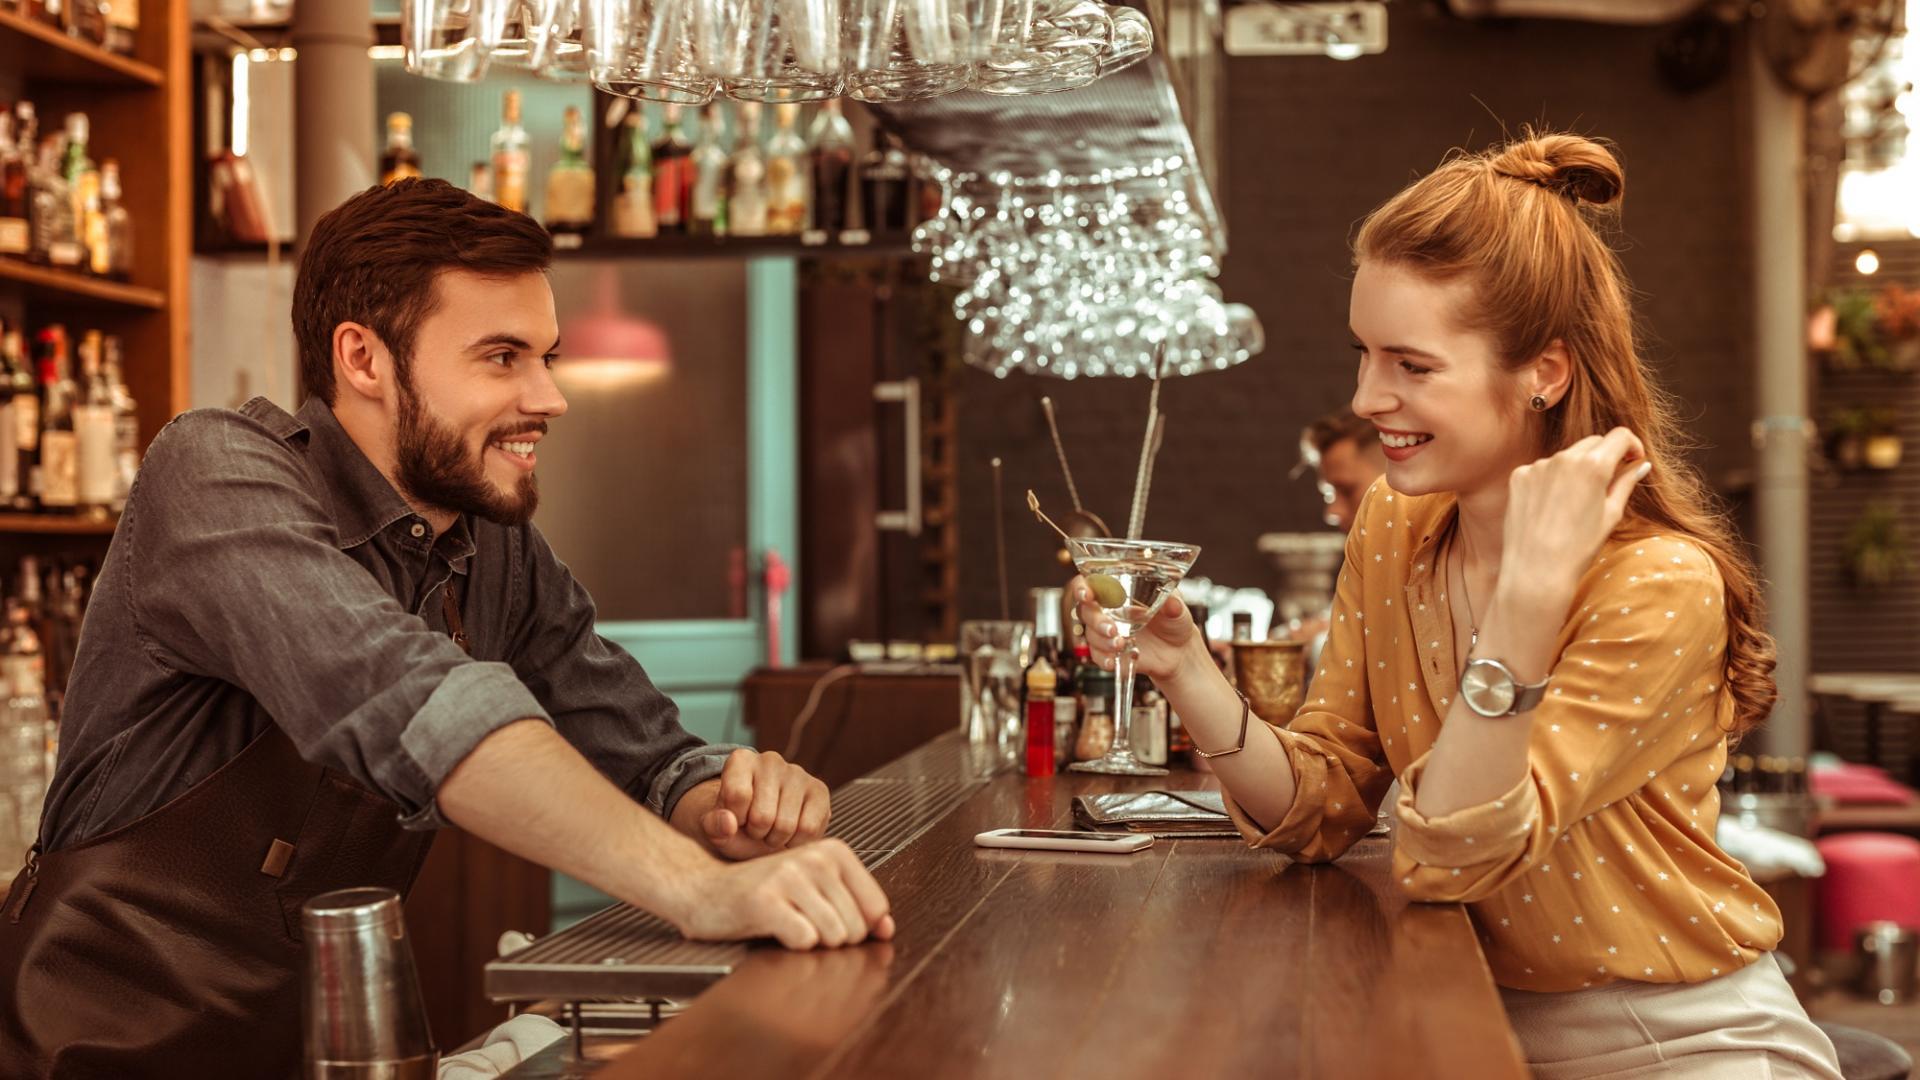 Mann, Frau, Kennelernen, Bar, Gespräch